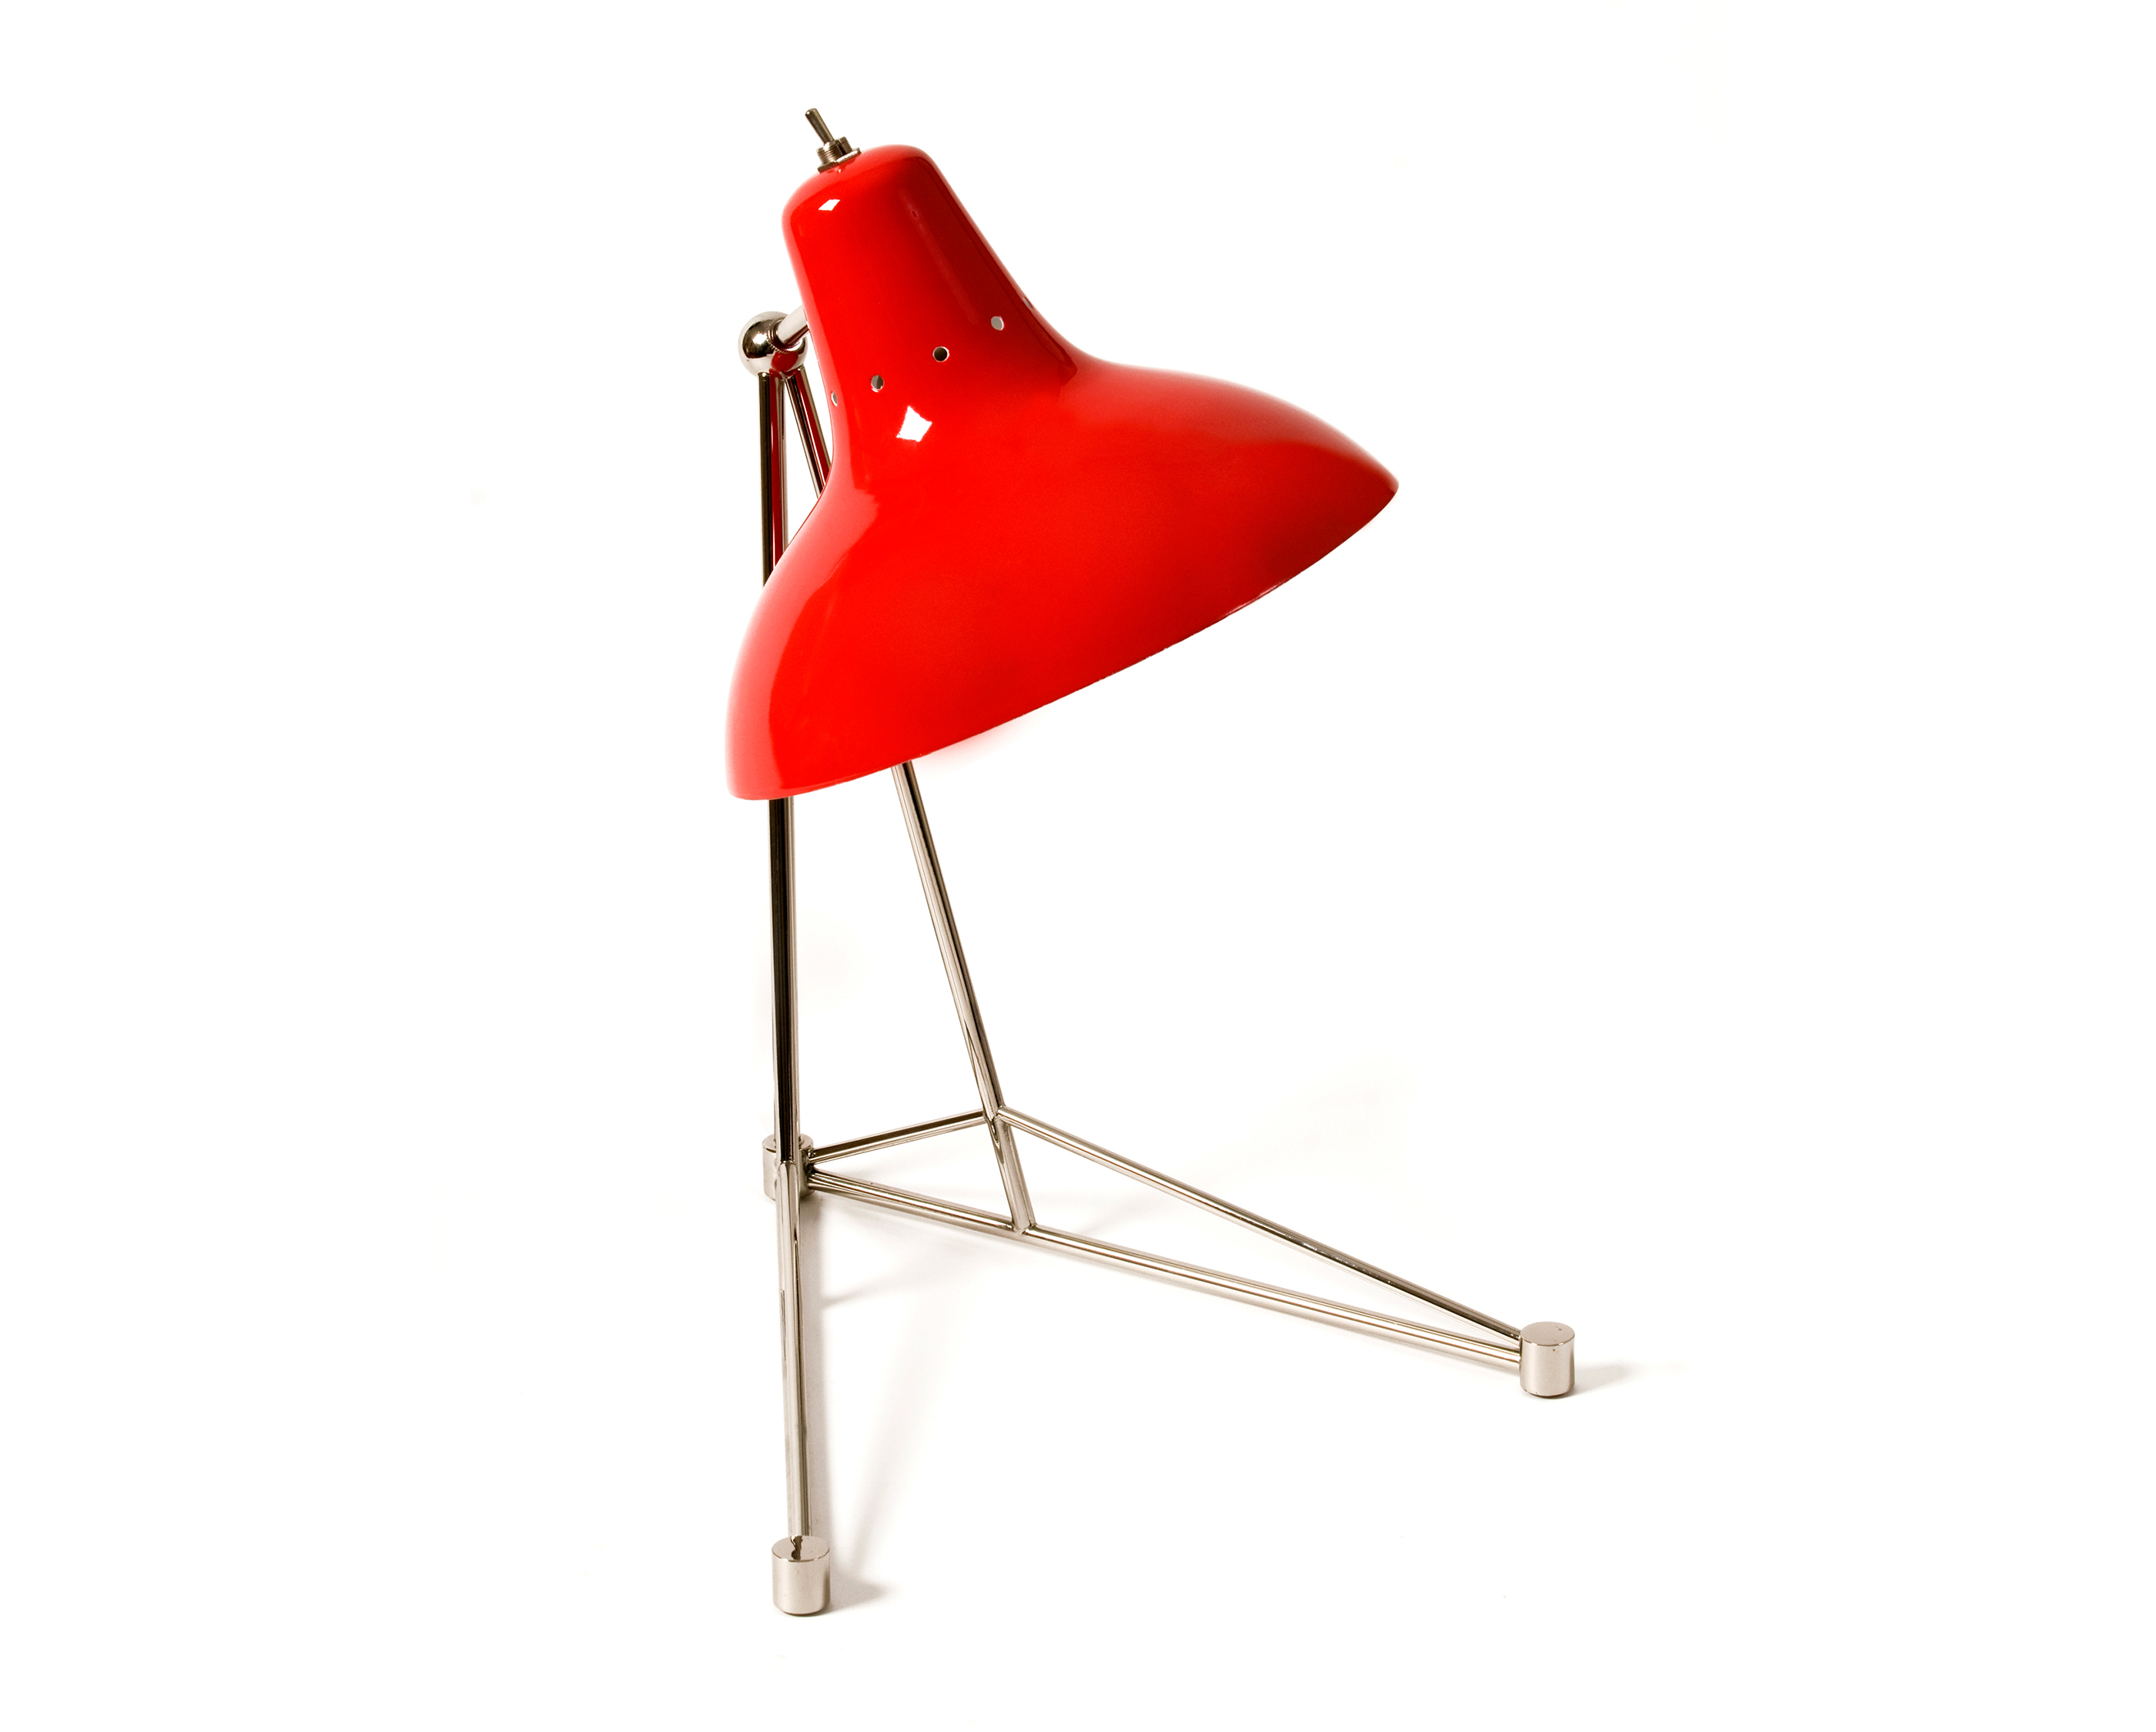 bedroom decor ideas Bedroom Decor Ideas: 50 Inspirational Table Lamps custom1 diana table custom glossy red zoom